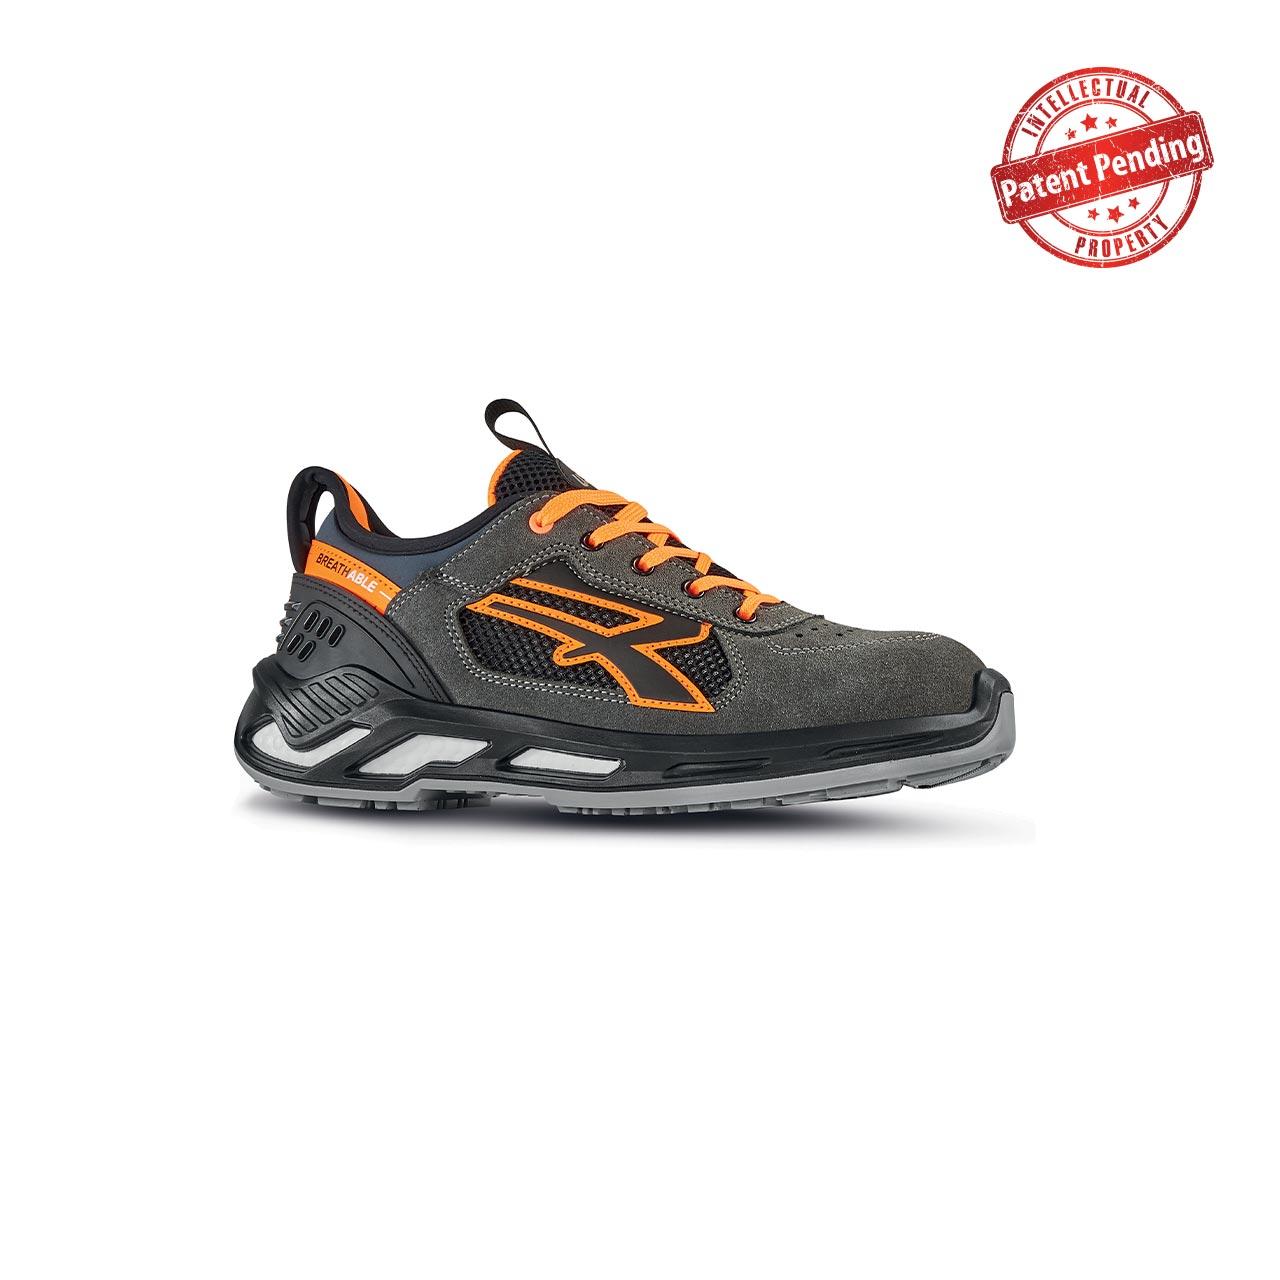 scarpa antinfortunistica upower modello ryder linea red360 vista laterale